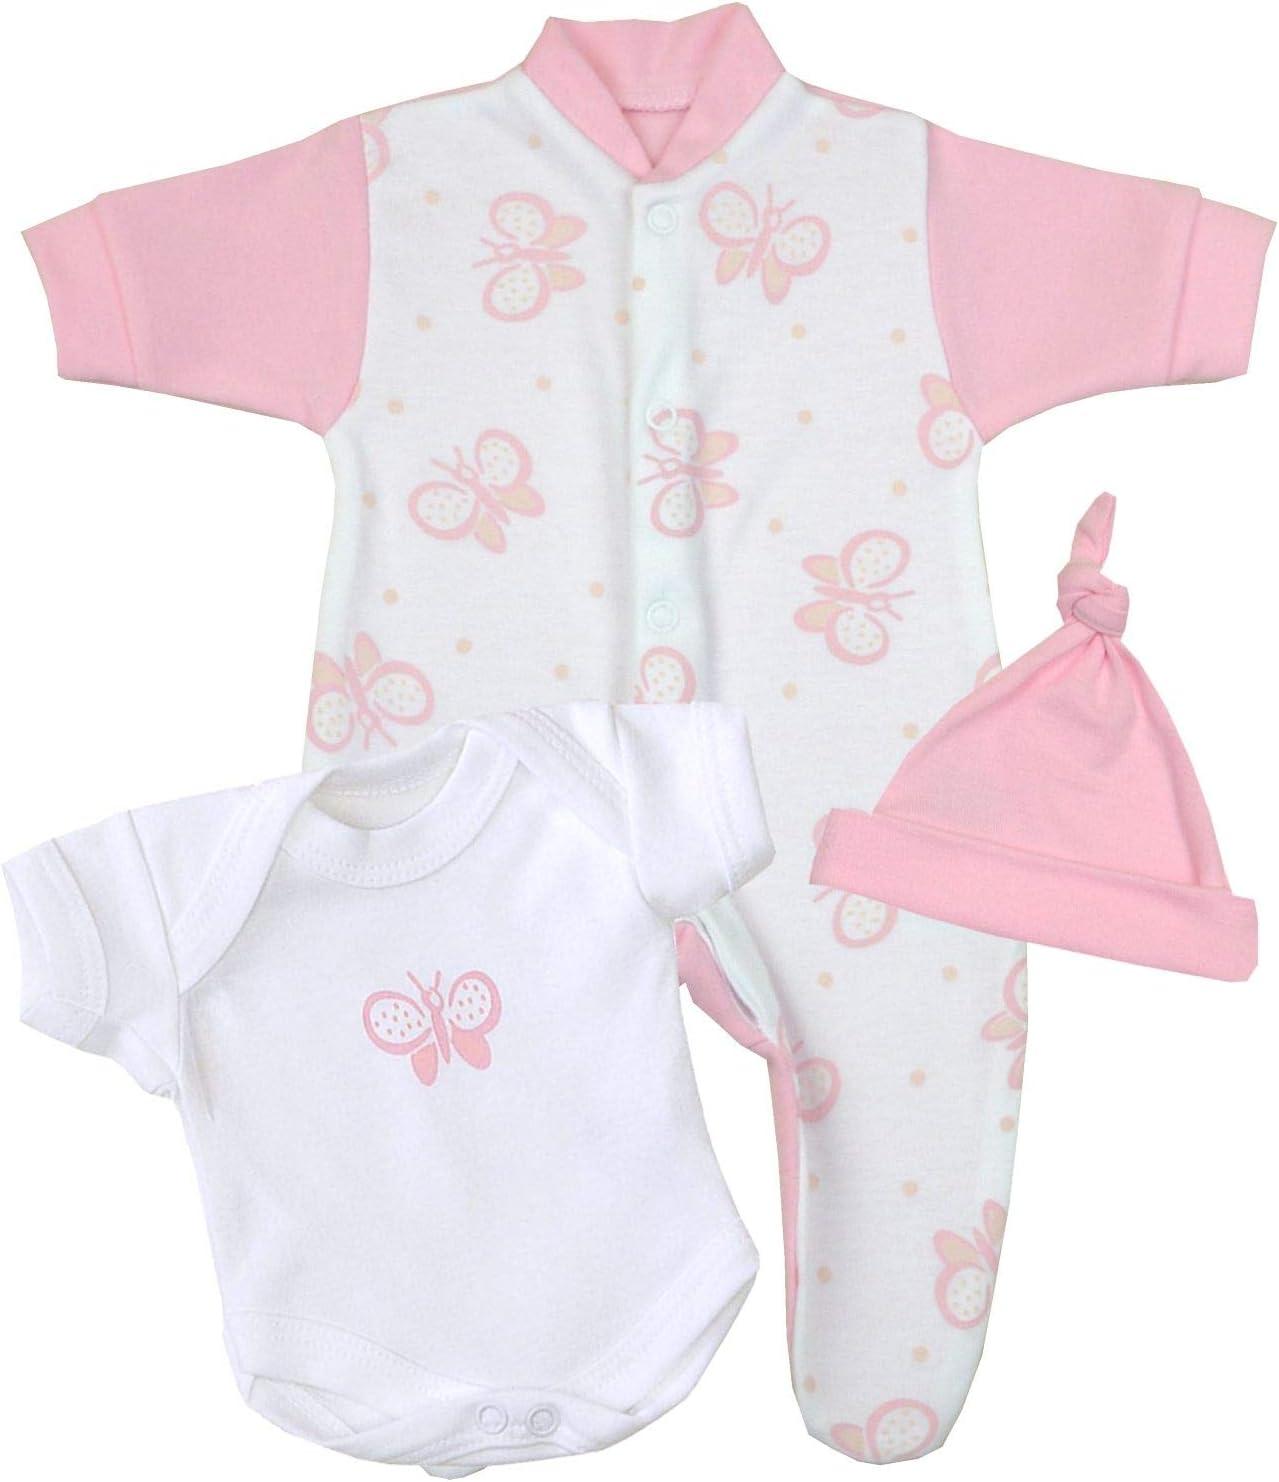 Baby/'s 3 Piece Set Gift Bib Brand New Sleepsuit -Vest